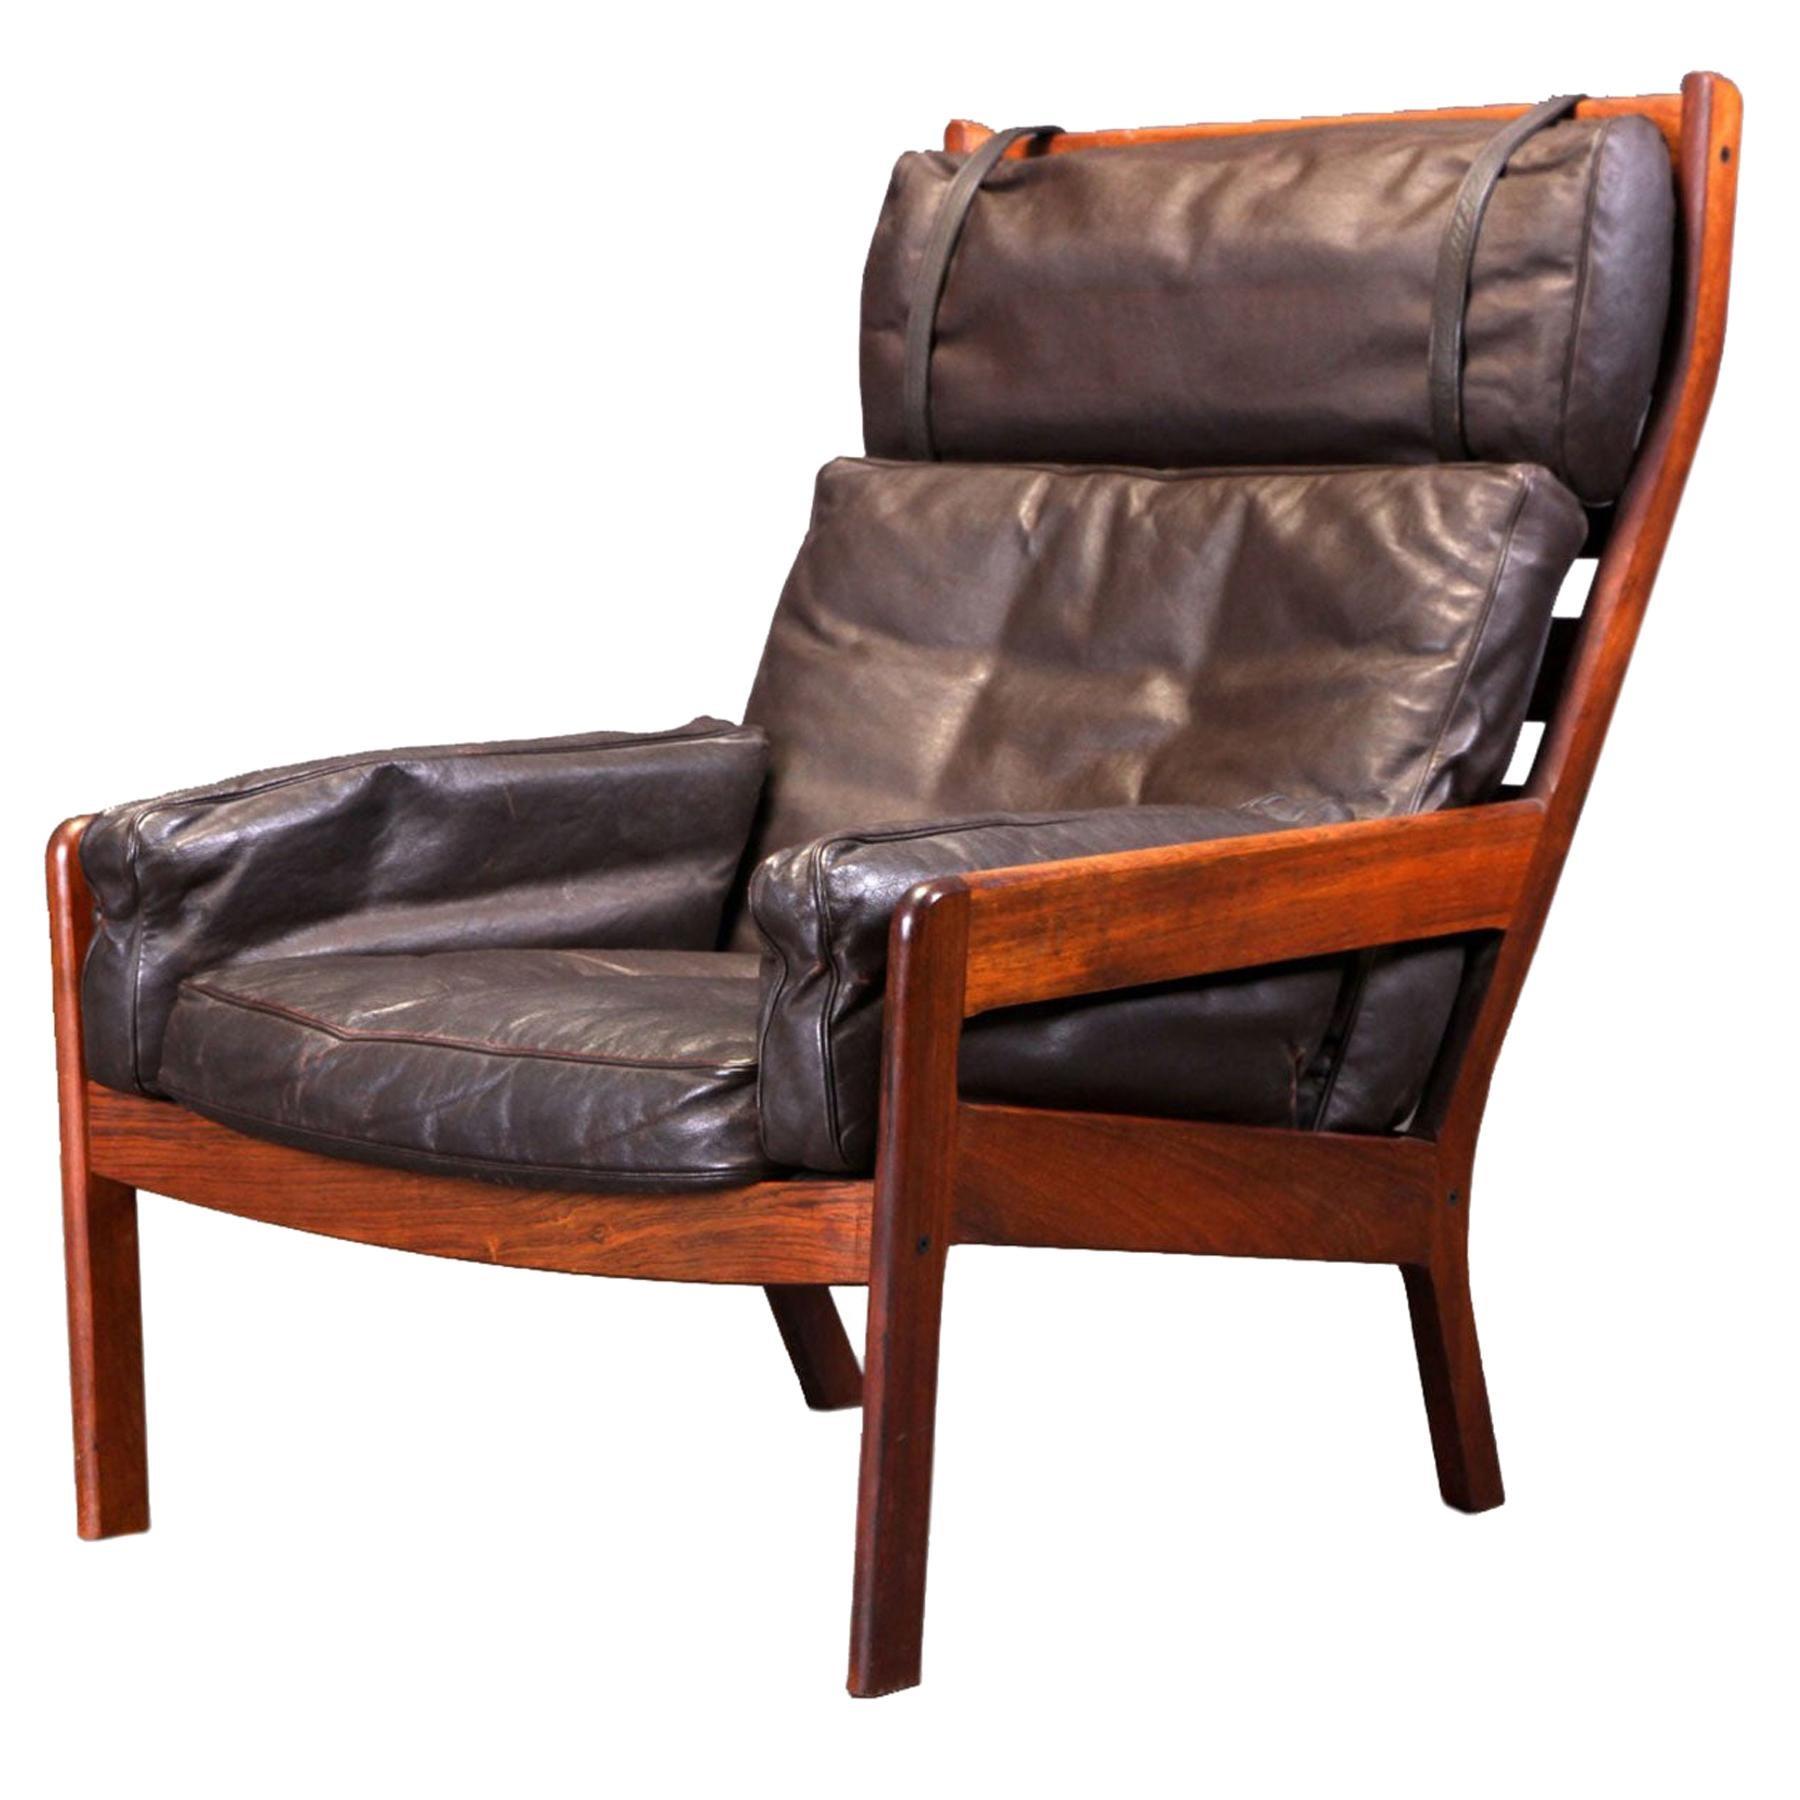 Erik Ole Jørgensen Gj 13 Highback Lounge Chair in Rosewood